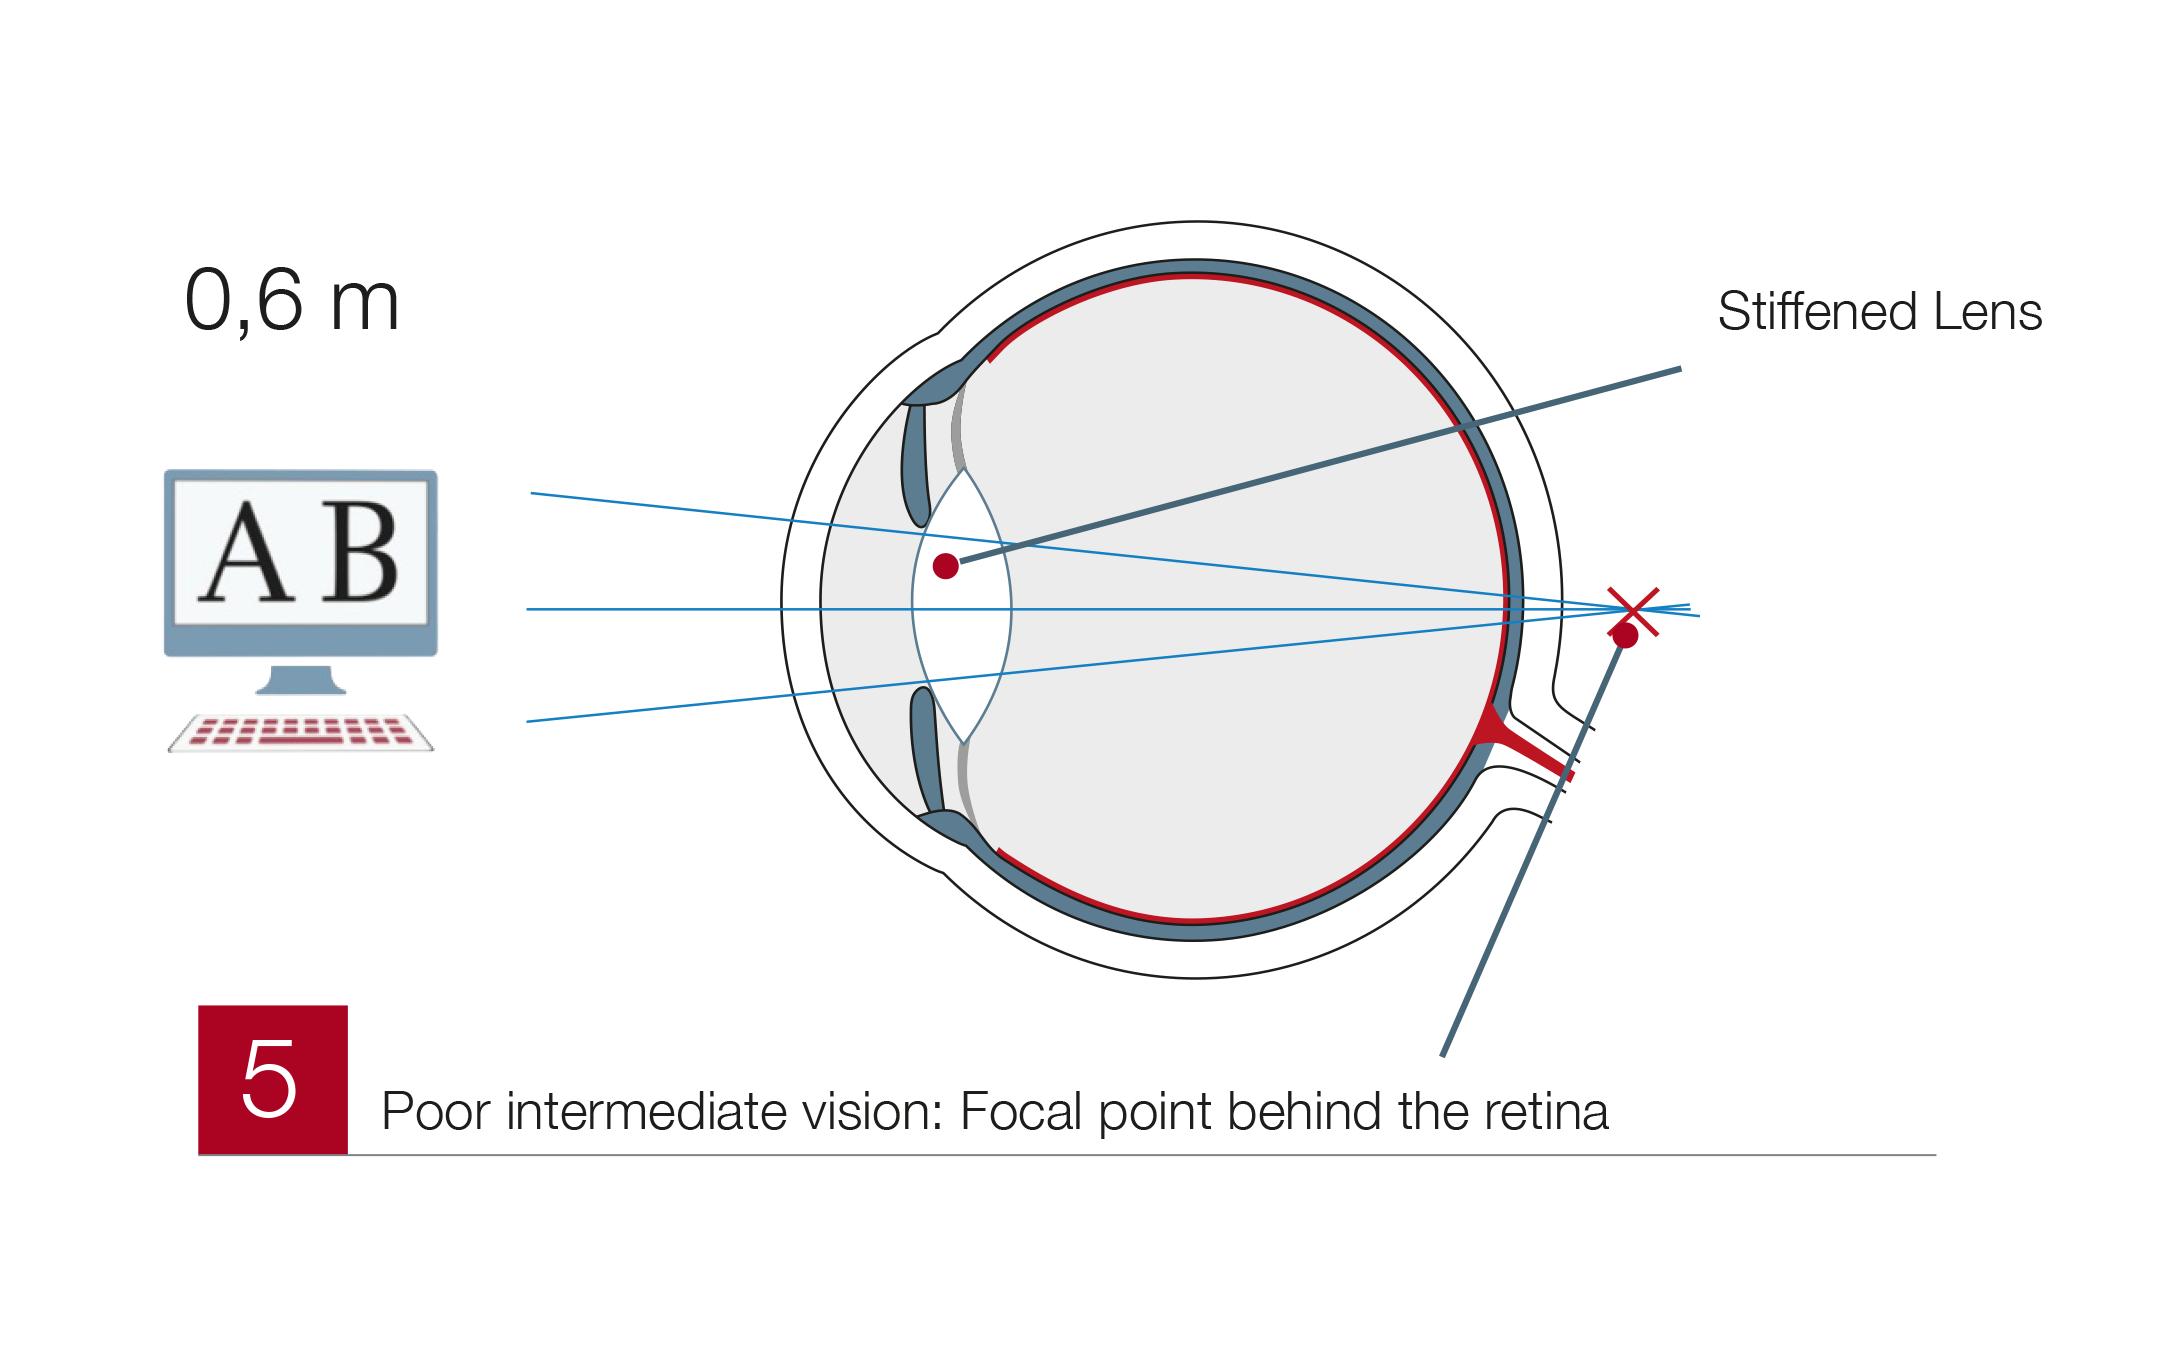 Presbyopia5